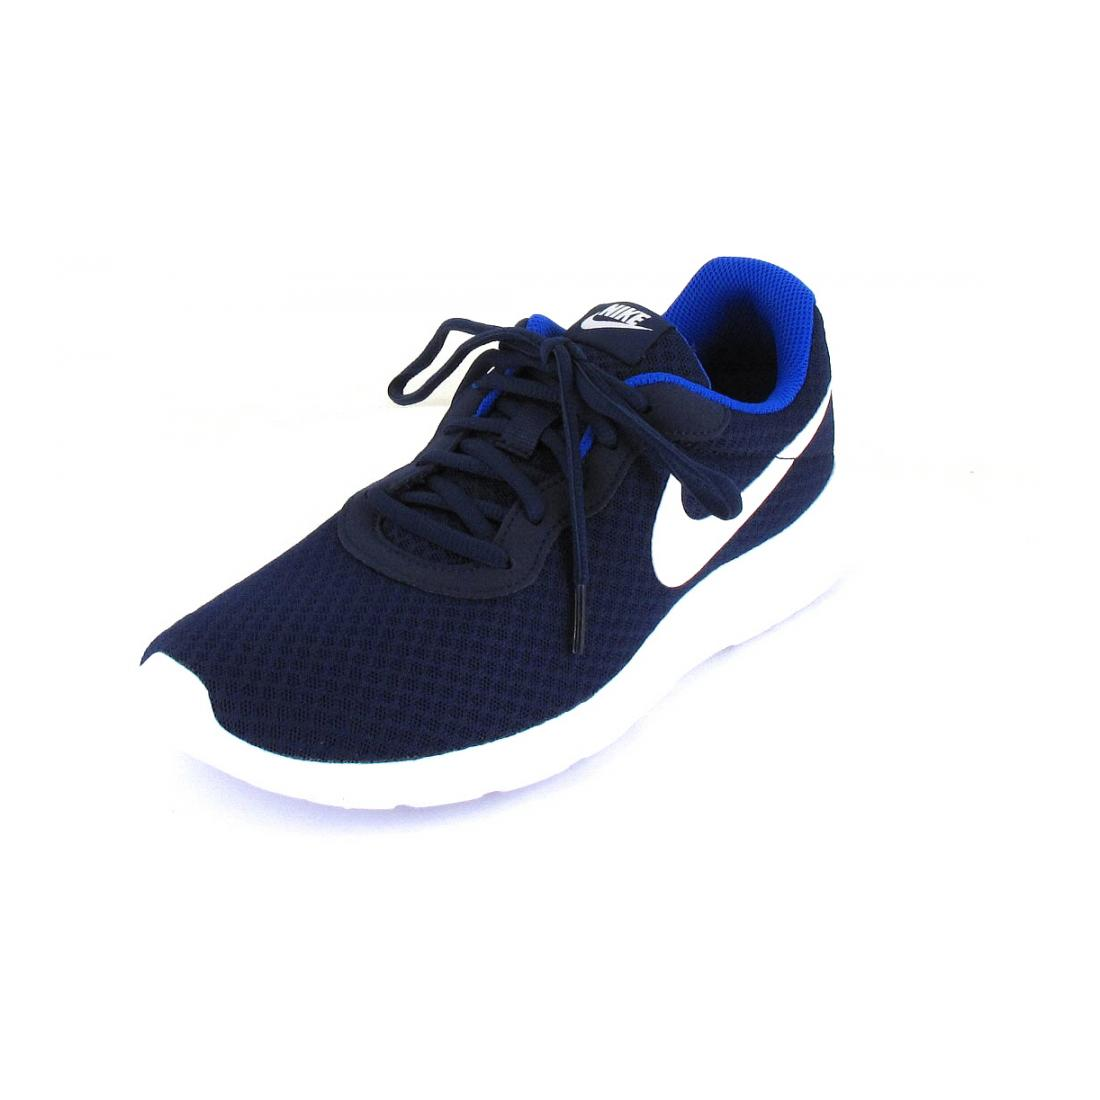 "Nike Sportschuh NIKE TANJUN MEN""S SHOE"